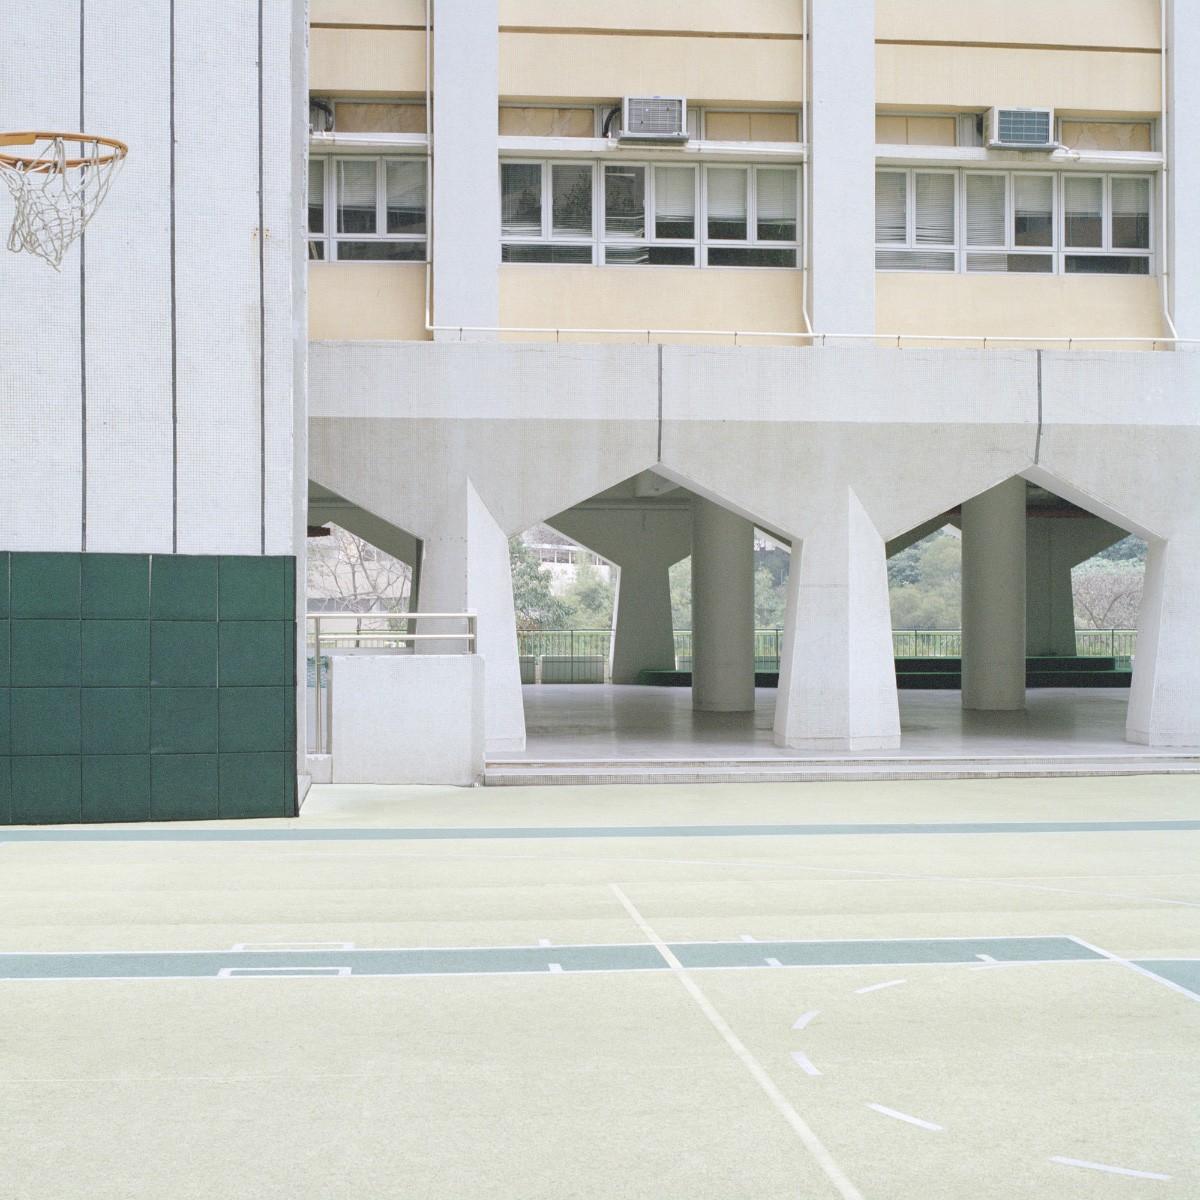 ward-roberts-courts-02.2-bd5ee4b6df02e21b258b1ba81d838212